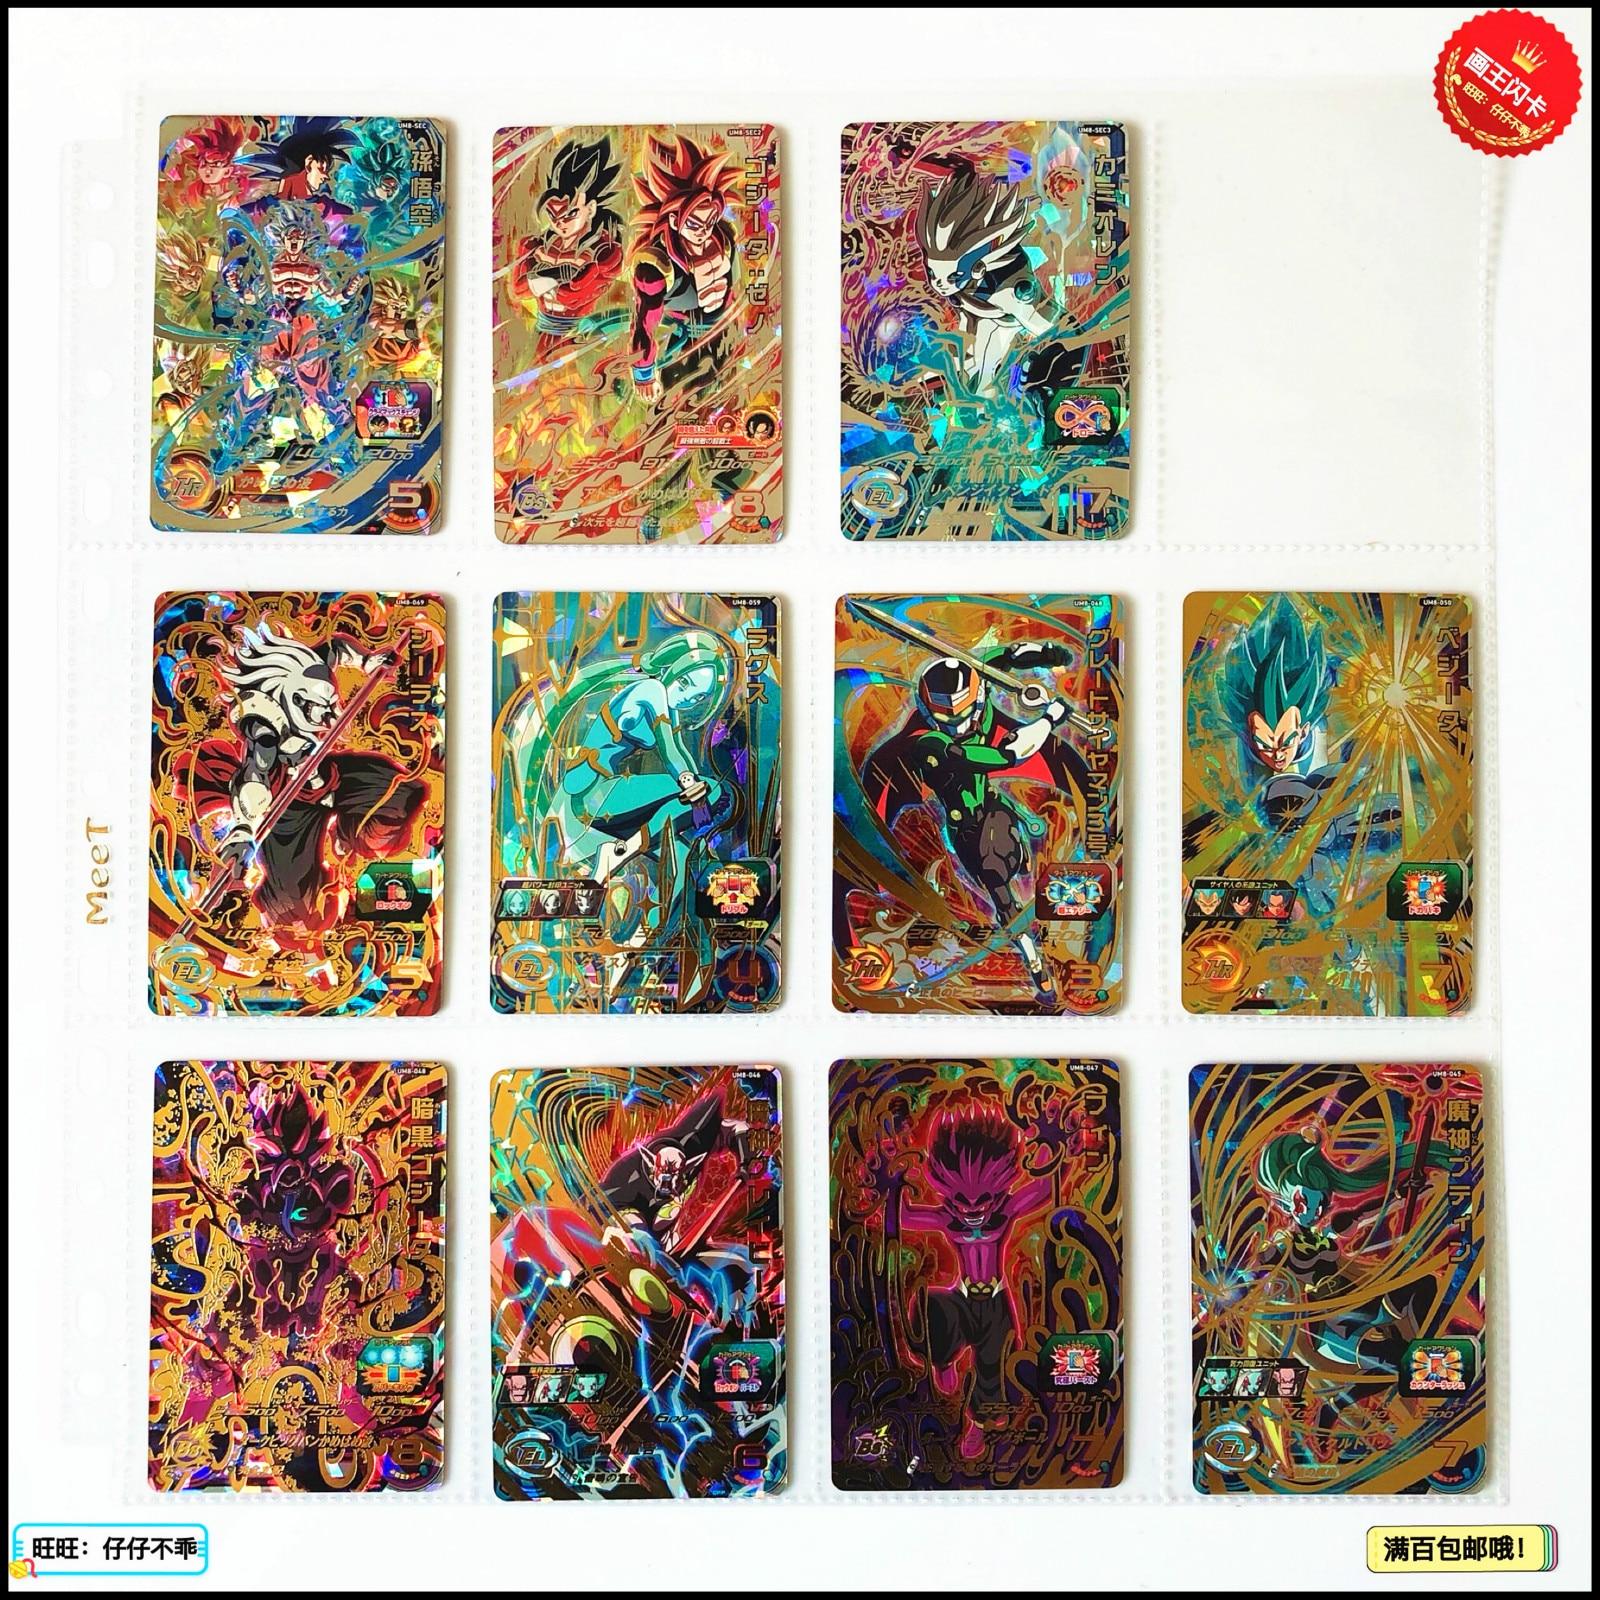 Japan Original Dragon Ball Hero Card 4 Stars SEC UM8 Goku Toys Hobbies Collectibles Game Collection Anime Cards